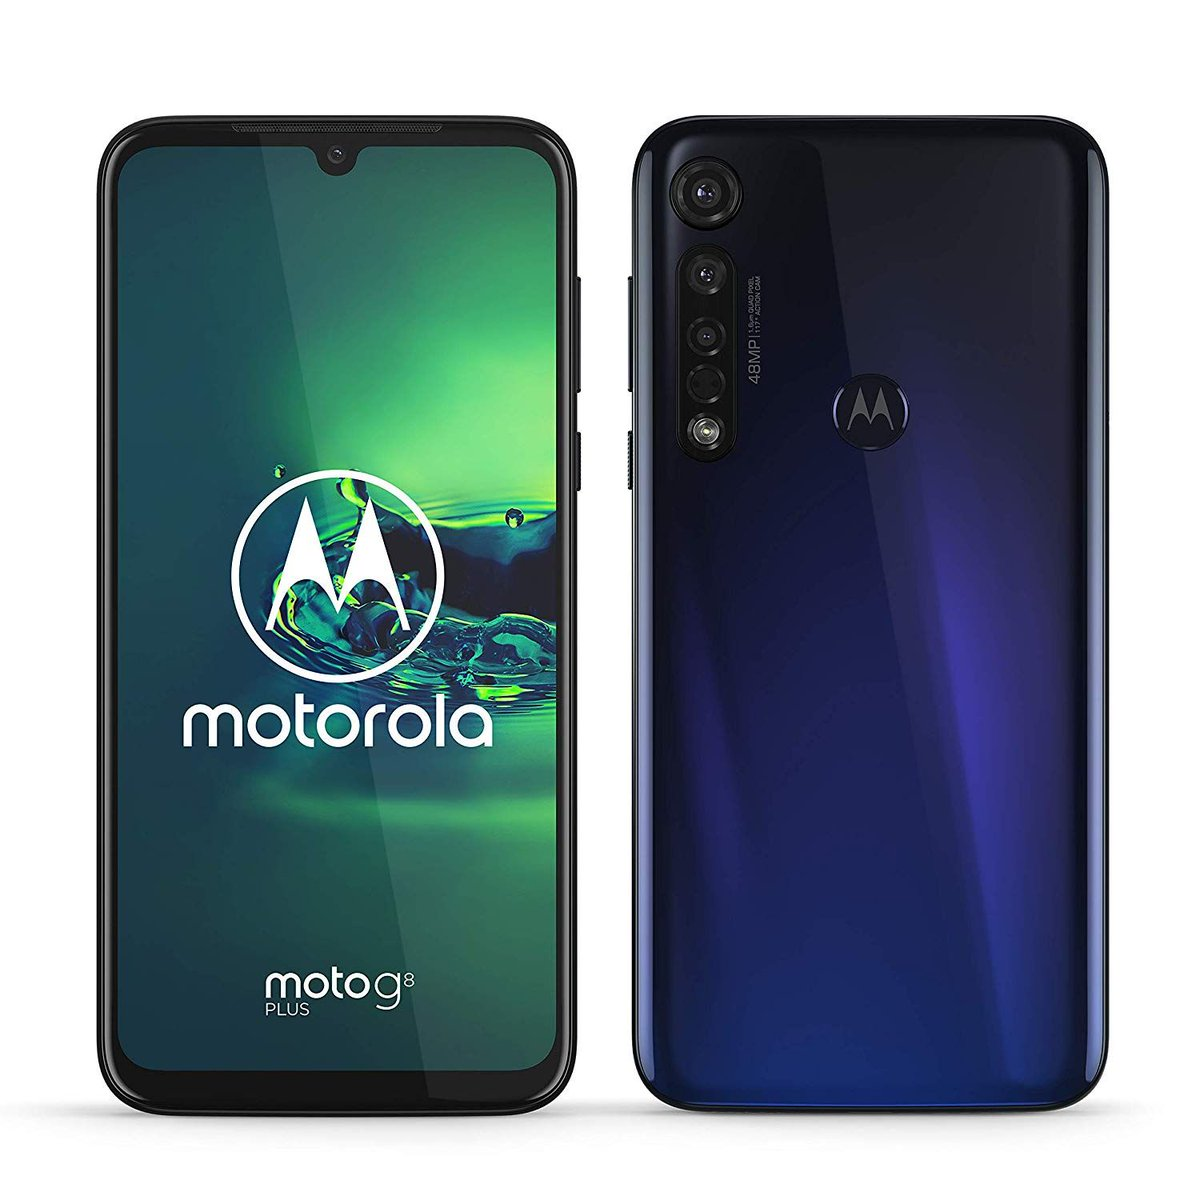 Motorola Moto G8 plus (display FHD 6,3, sensore fotocamera da 48 MP , altoparlanti stereo Dolby®, 64 GB/ 4GB, Android 9.0, Smartphone Dual SIM ), Cosmic Blue:buff.ly/2LILjjp #Motorola #smartphone #Android #photo #video #storage #fast #Christmas #gift #tech #news #today